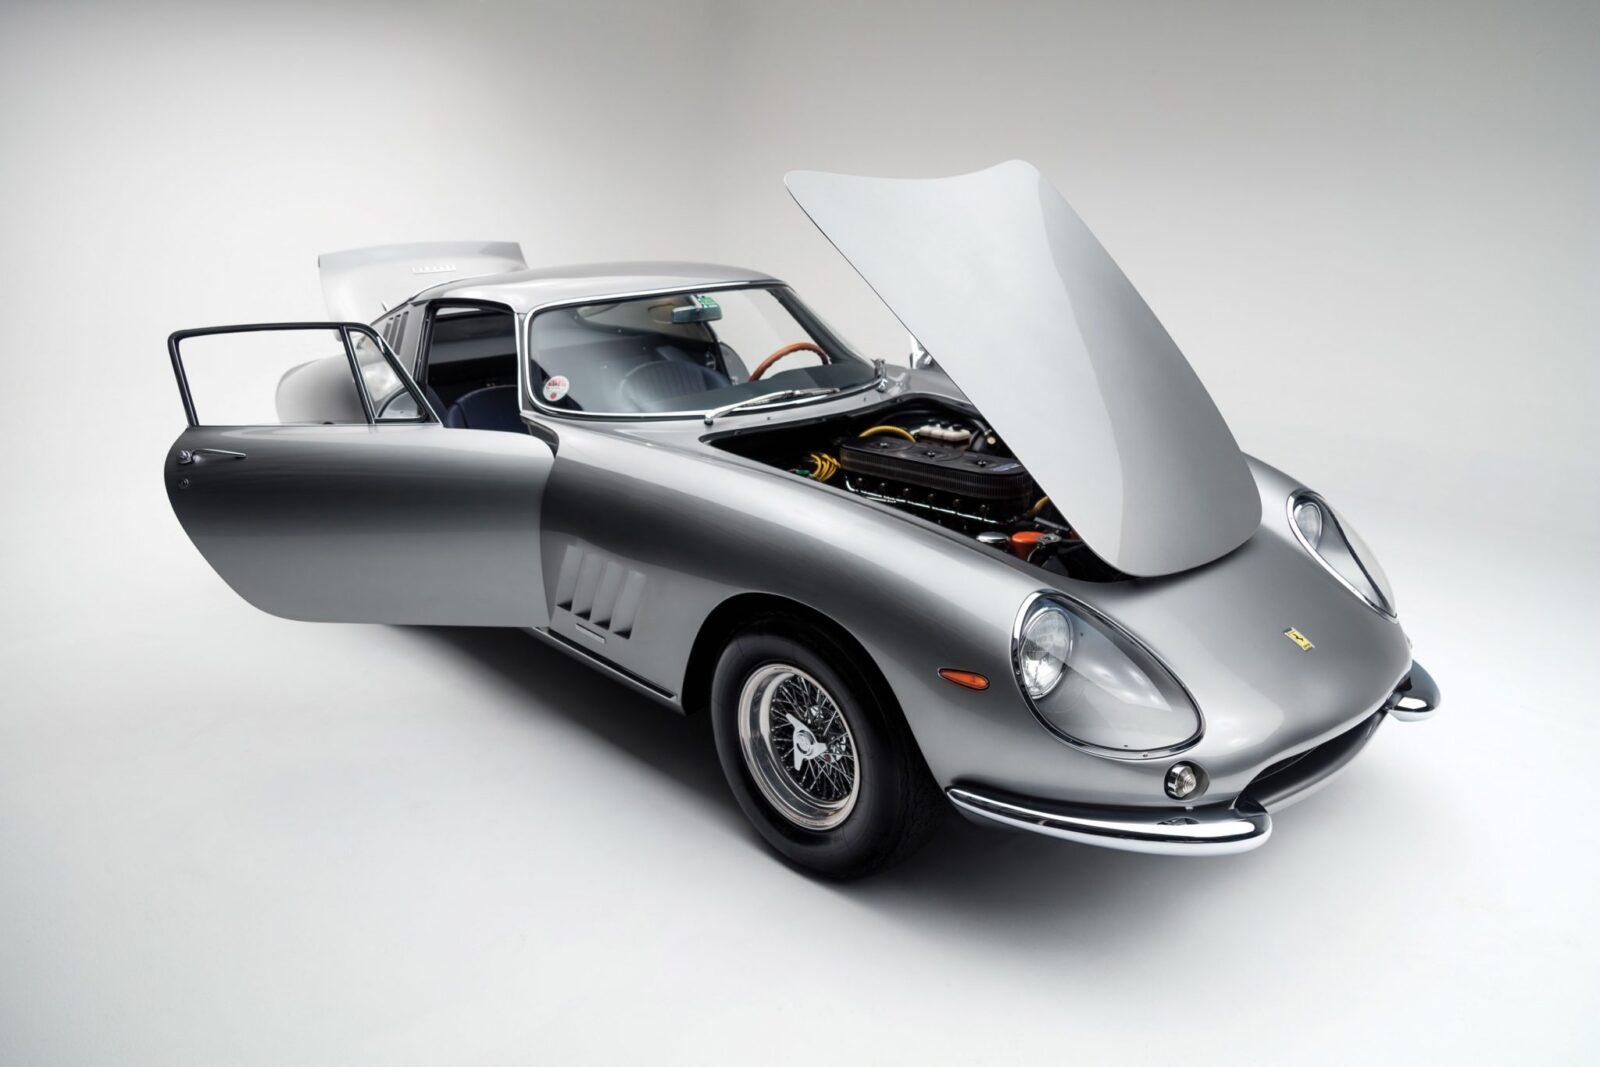 ferrari 275 gtb car 18 1600x1067 - 1965 Ferrari 275 GTB/6C Alloy